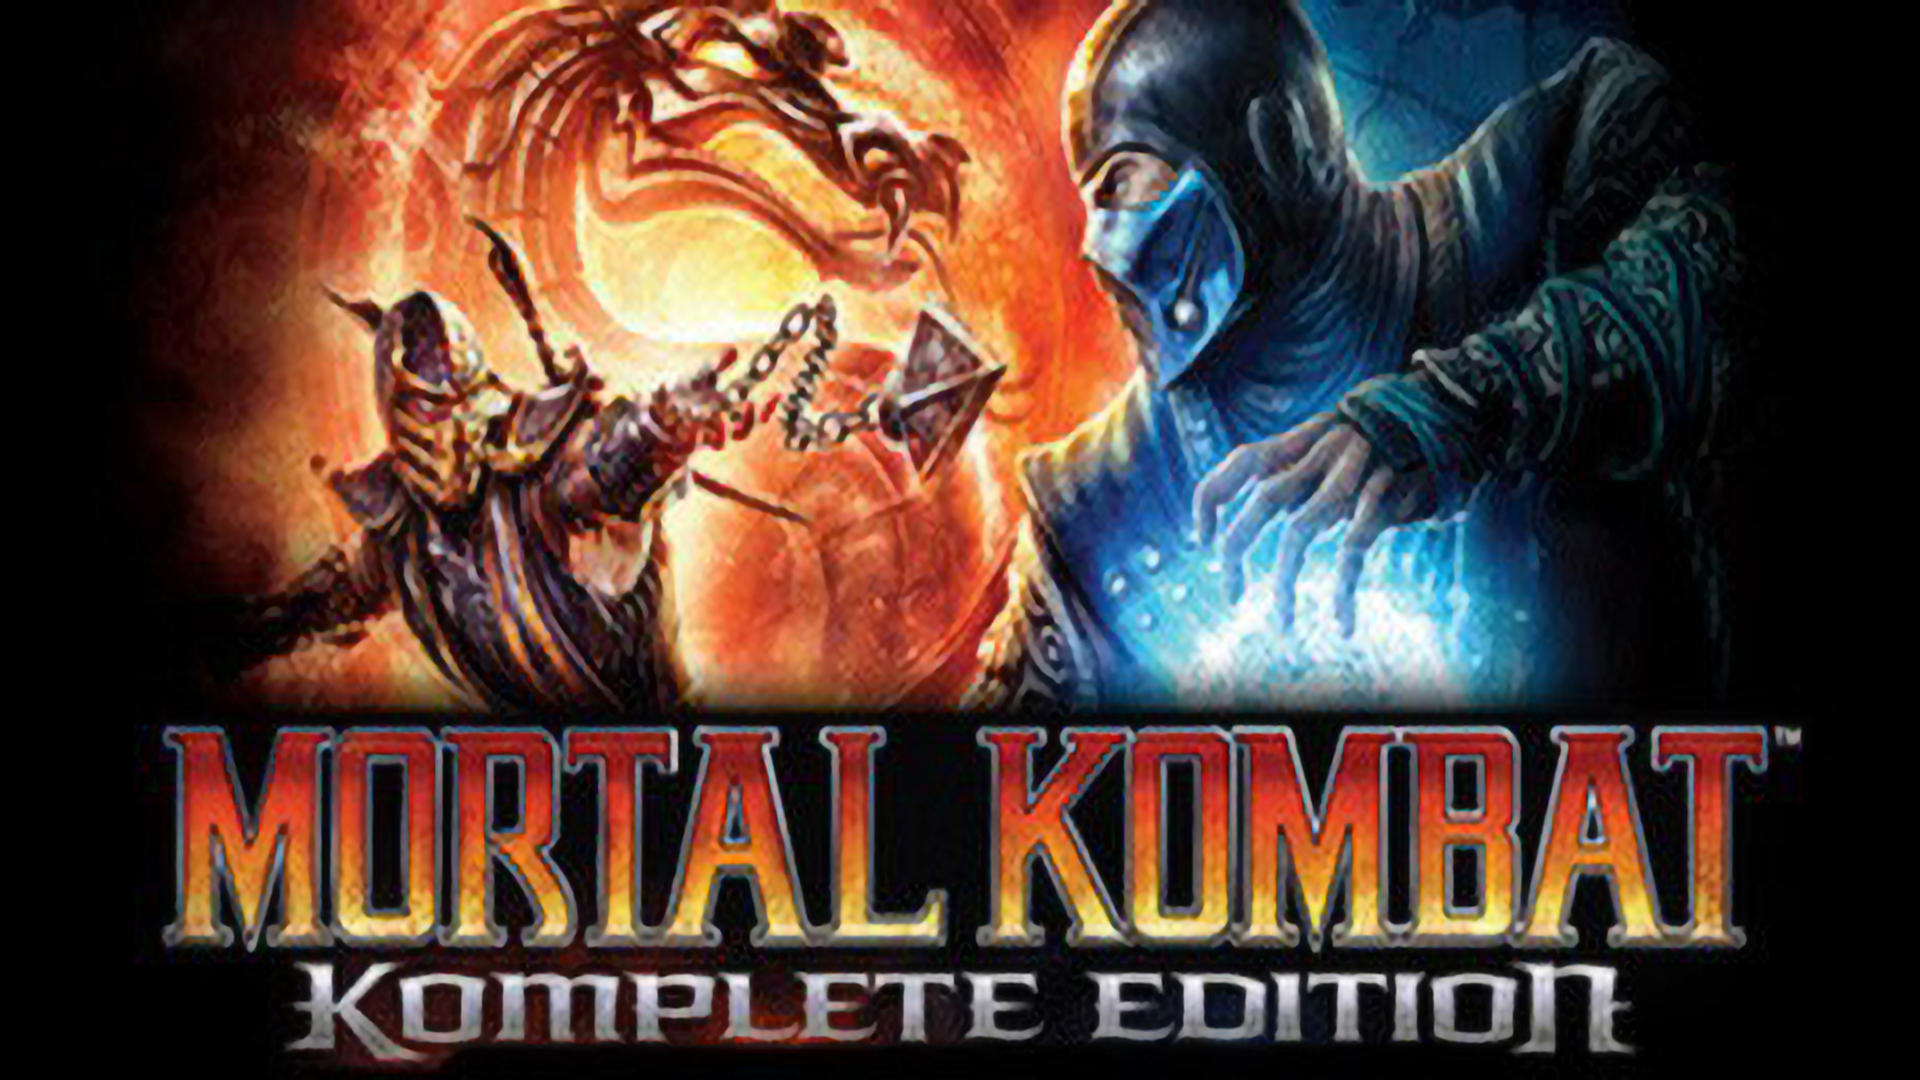 mk komplete edition moves